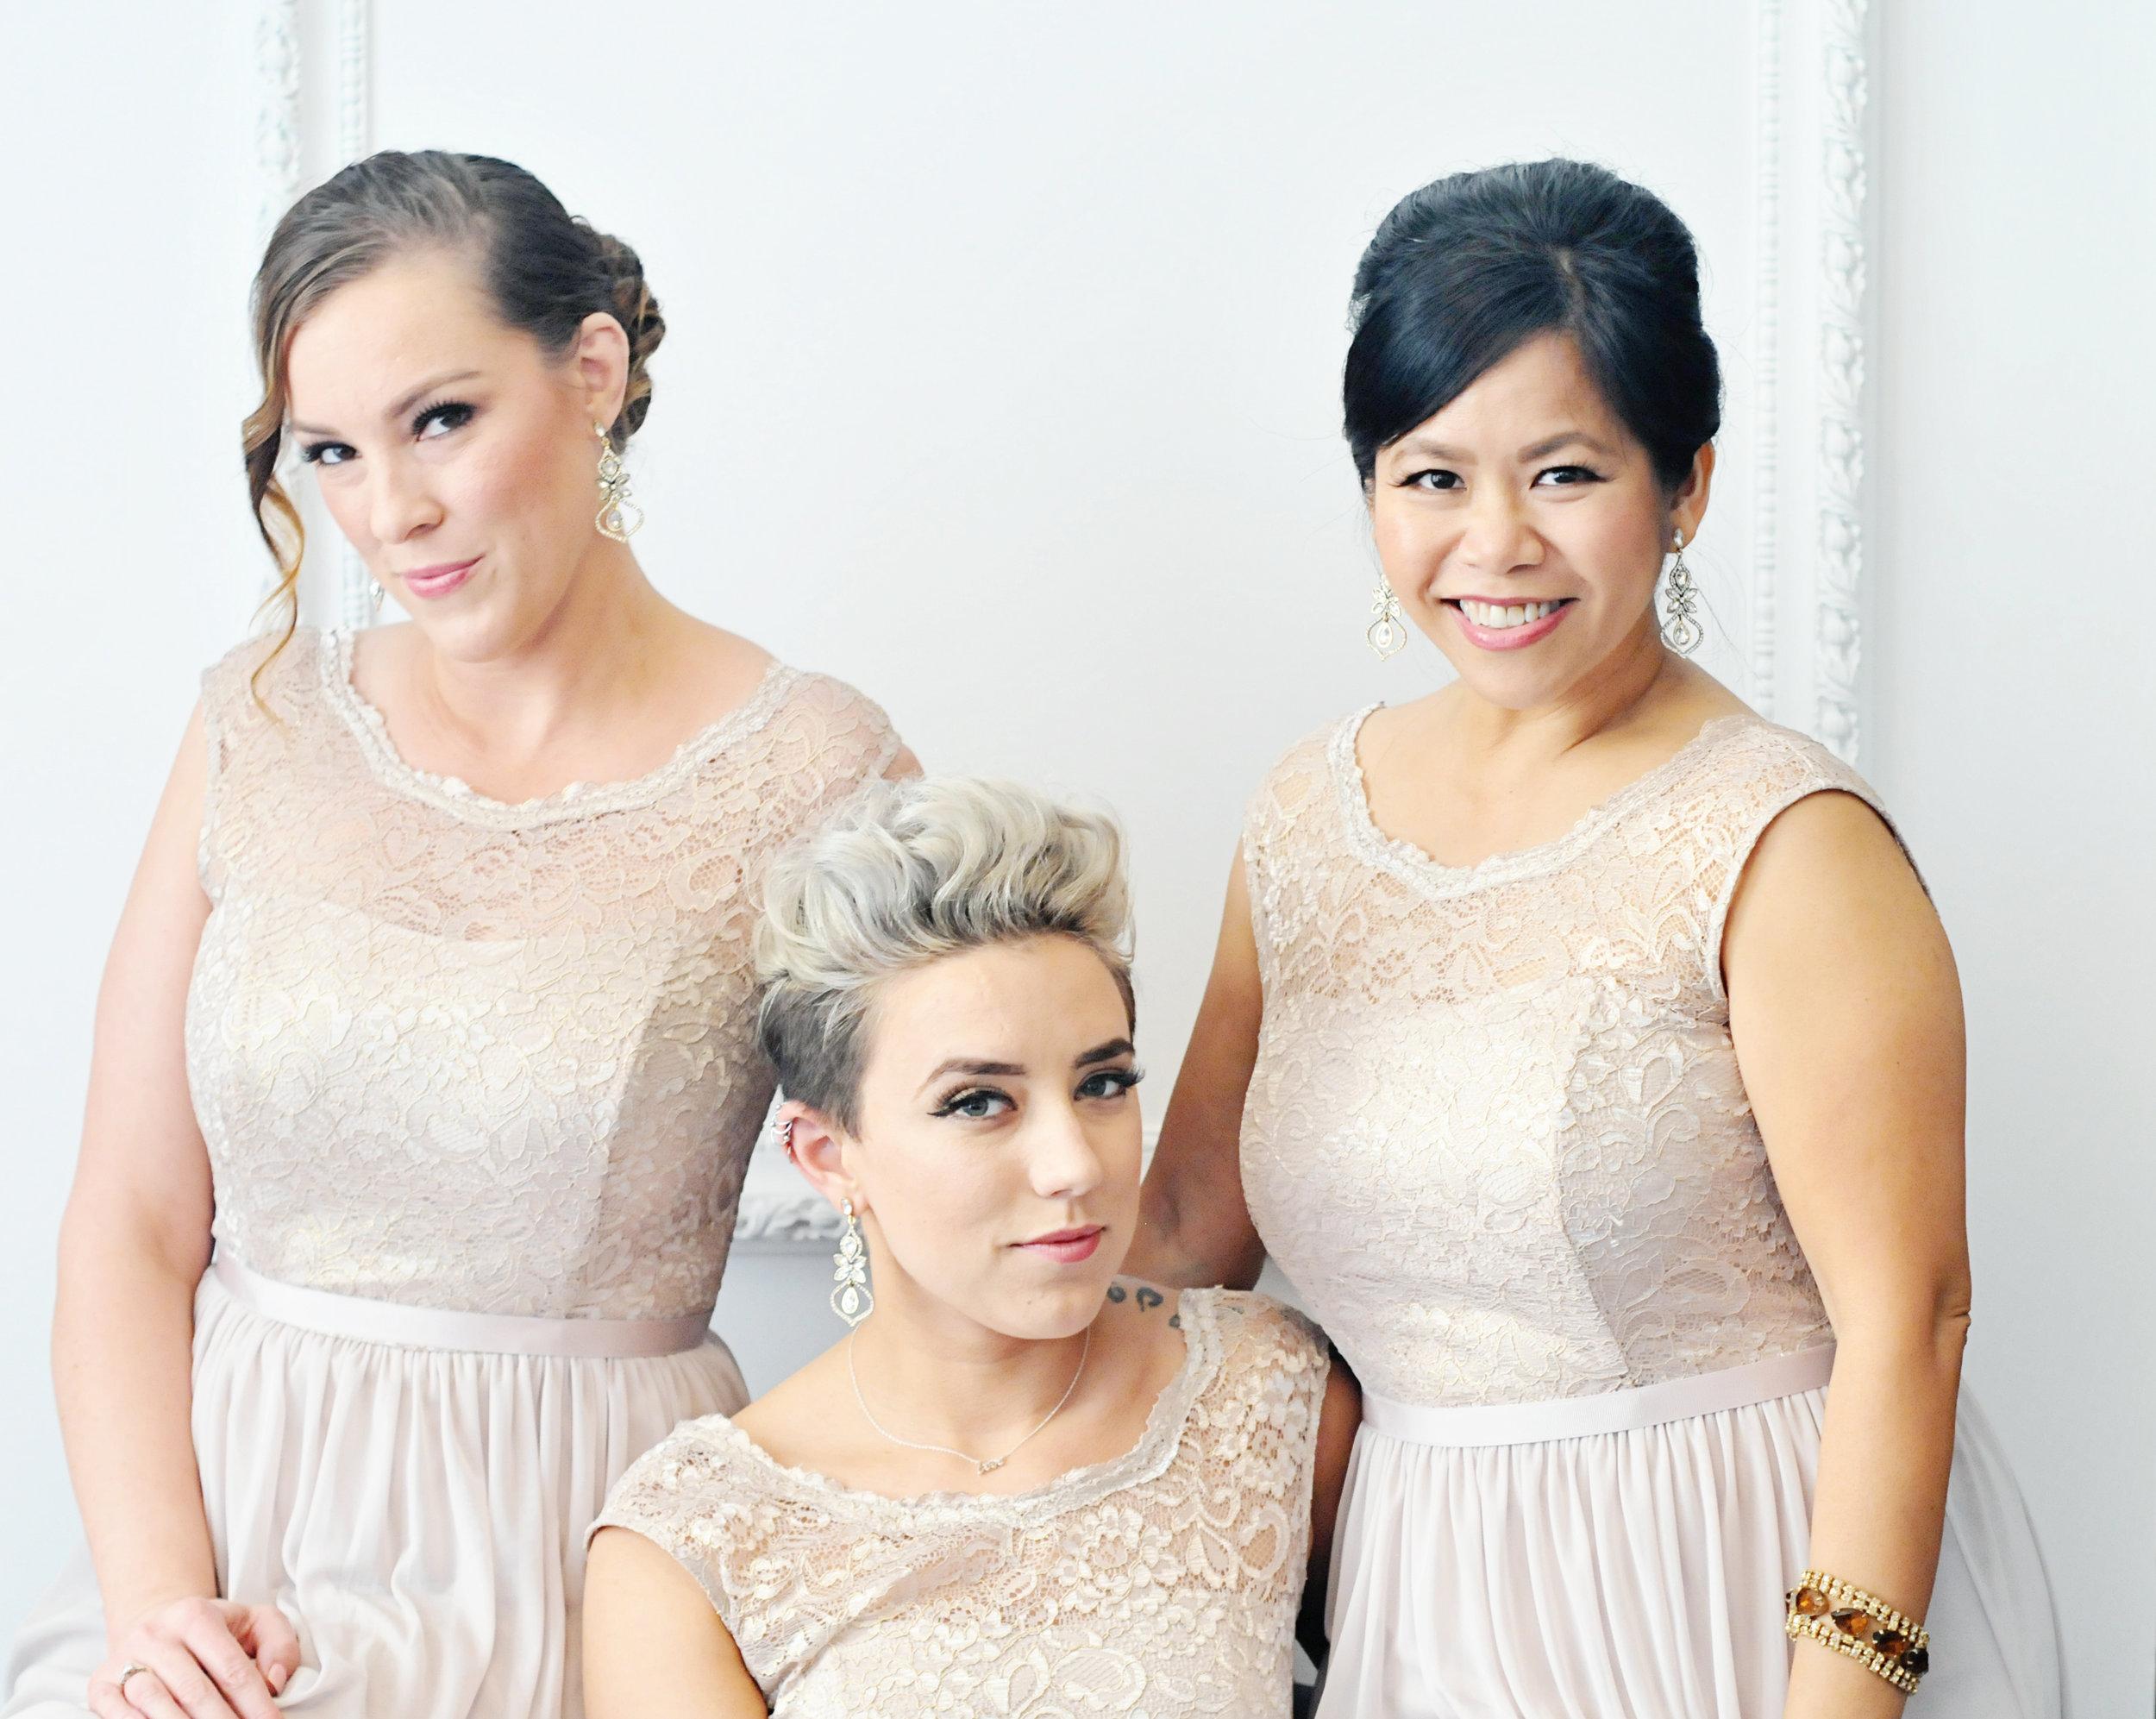 Partovi Wedding 2231 by maria pablo.jpg